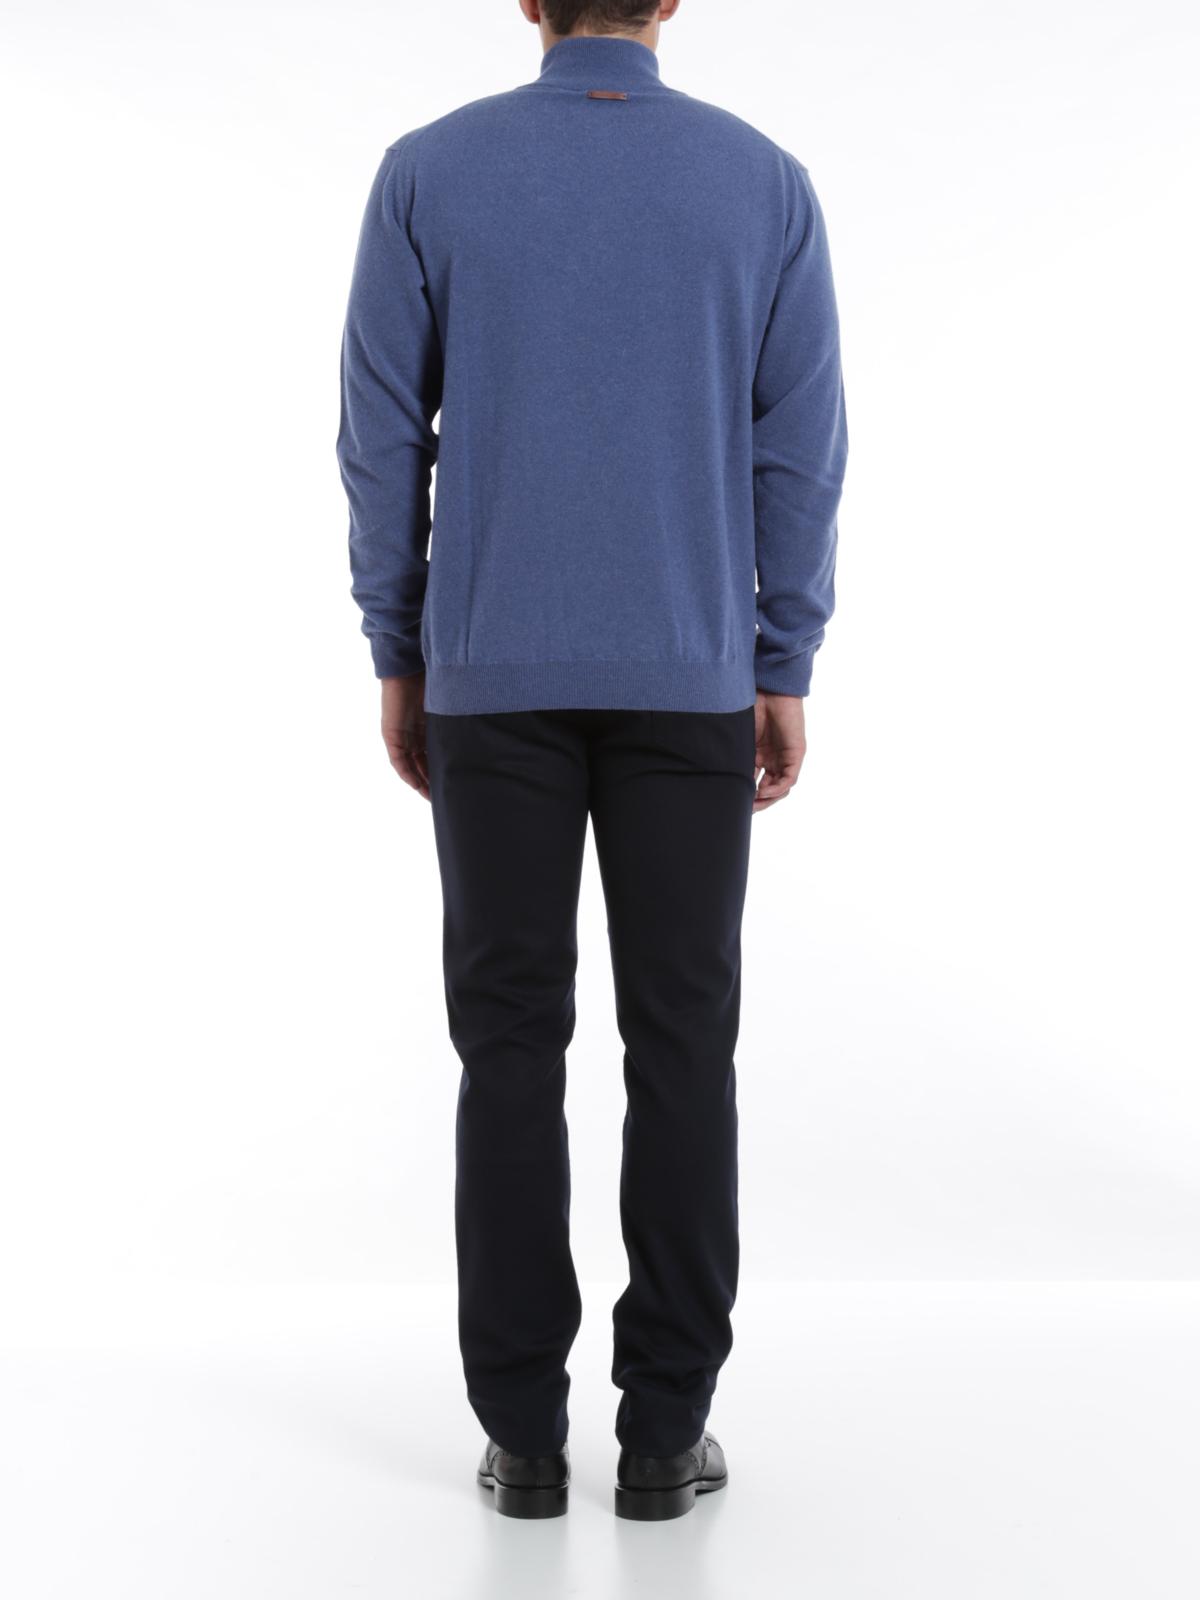 Jeans Style Trousers By Corneliani Casual IKRIX